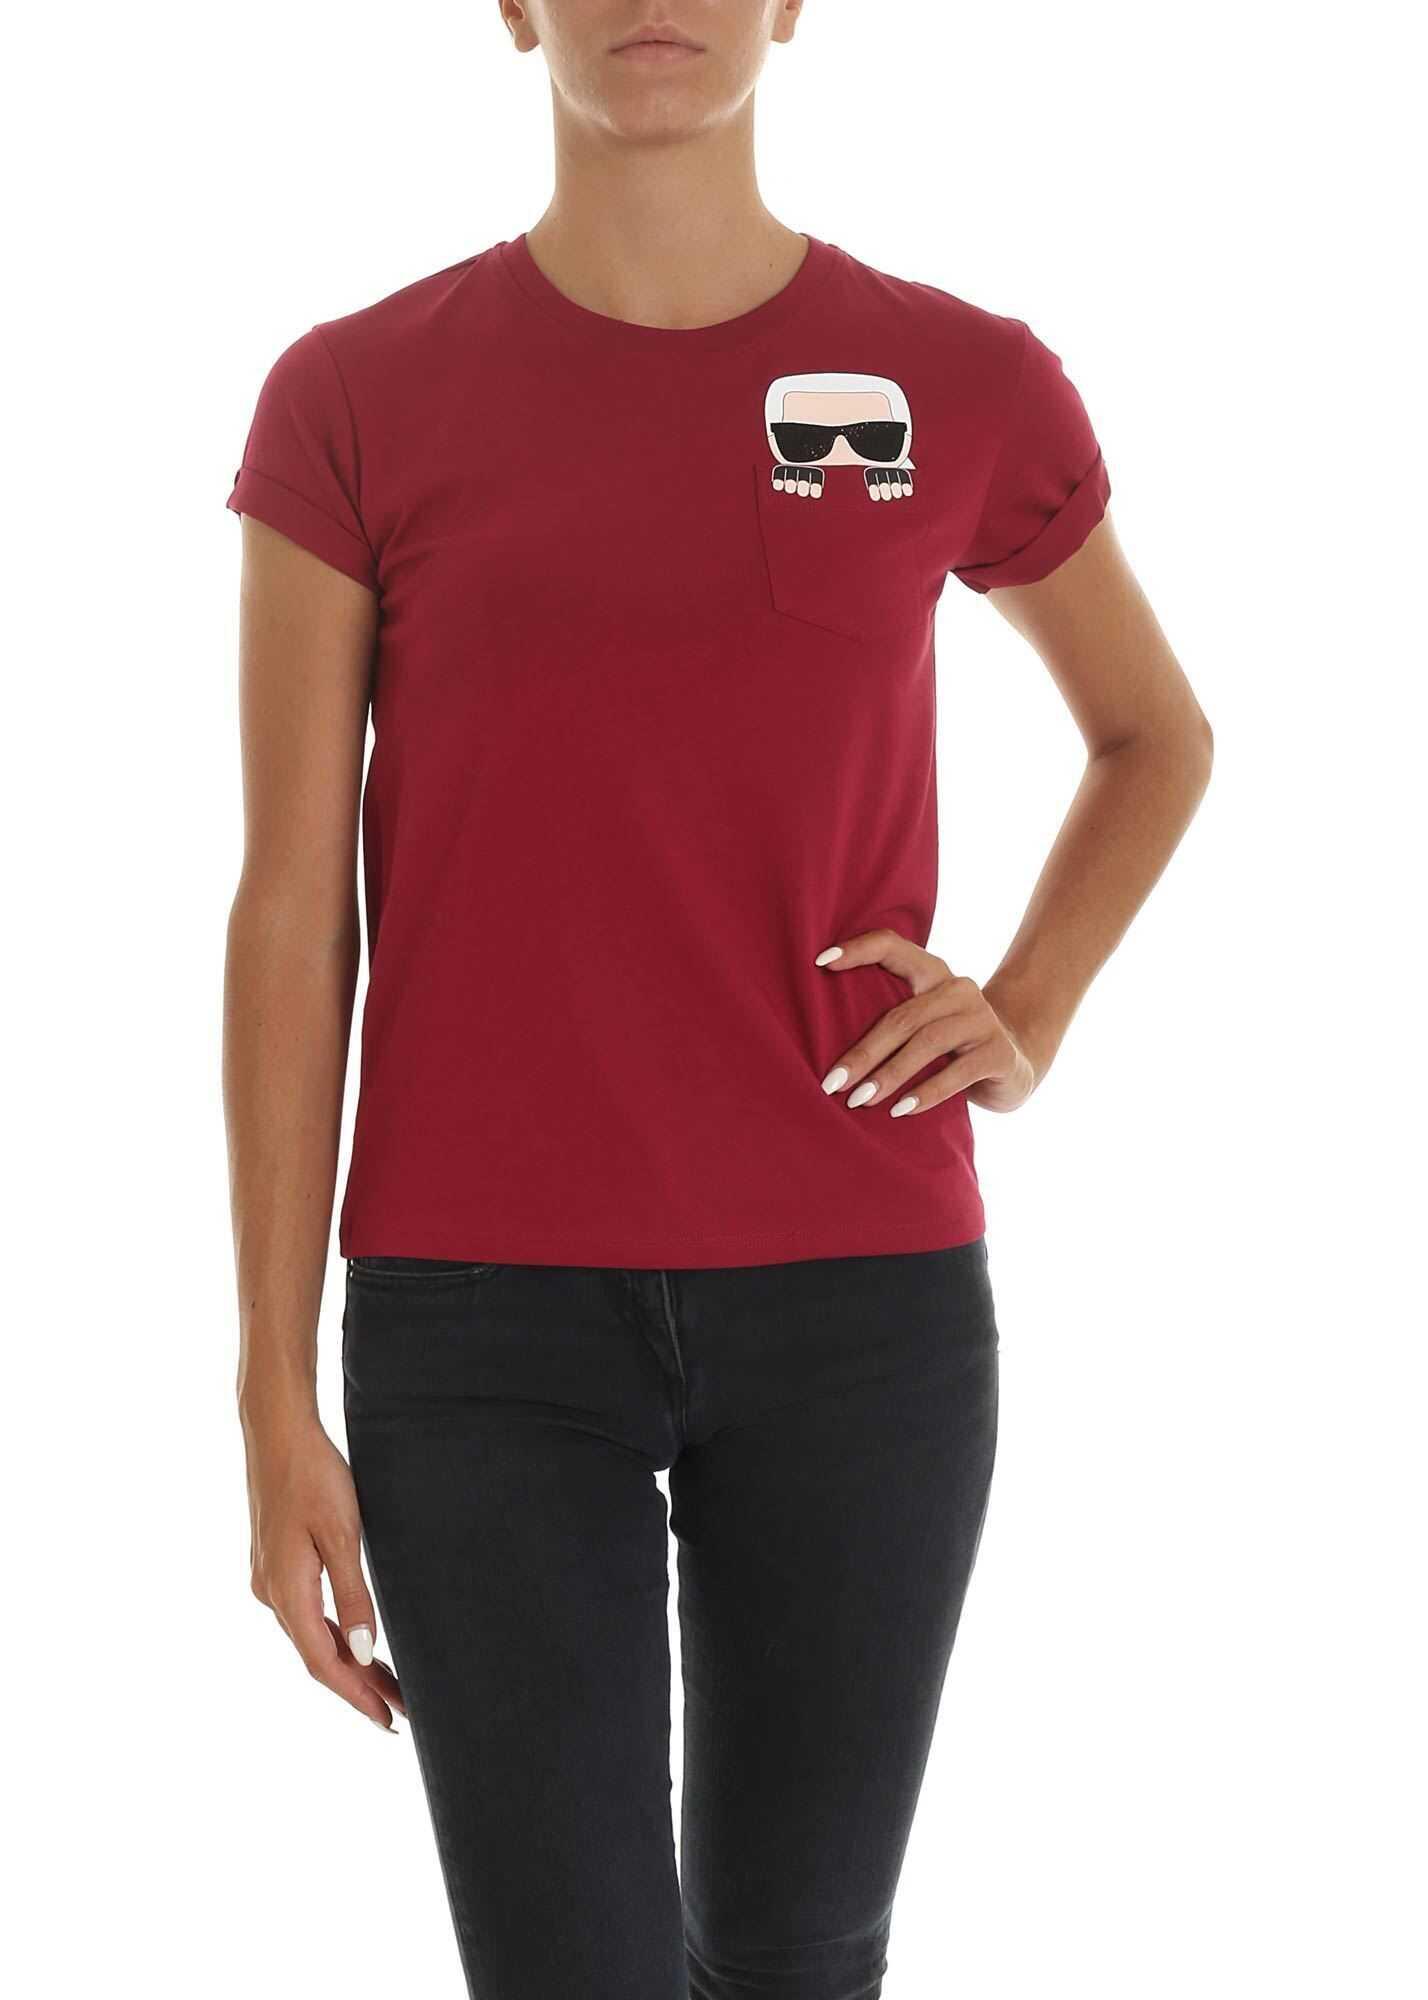 Karl Lagerfeld Ikonik Karl Pocket T-Shirt In Bordeaux Red